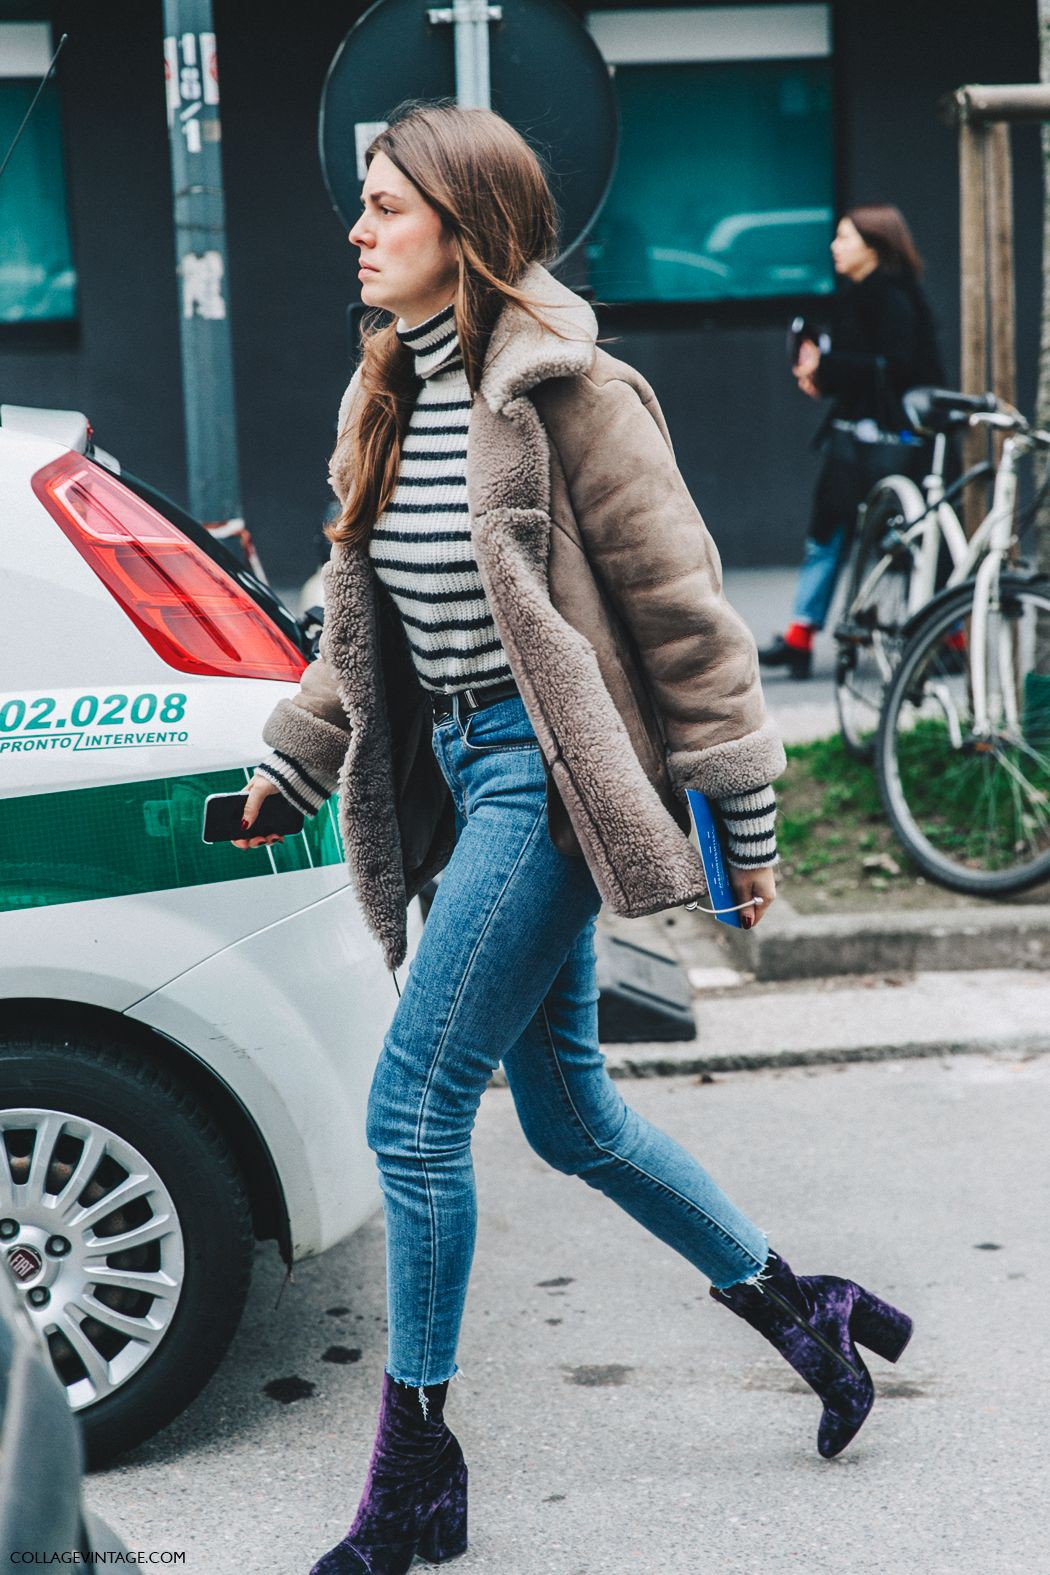 Velvet shoe street style, street fashion